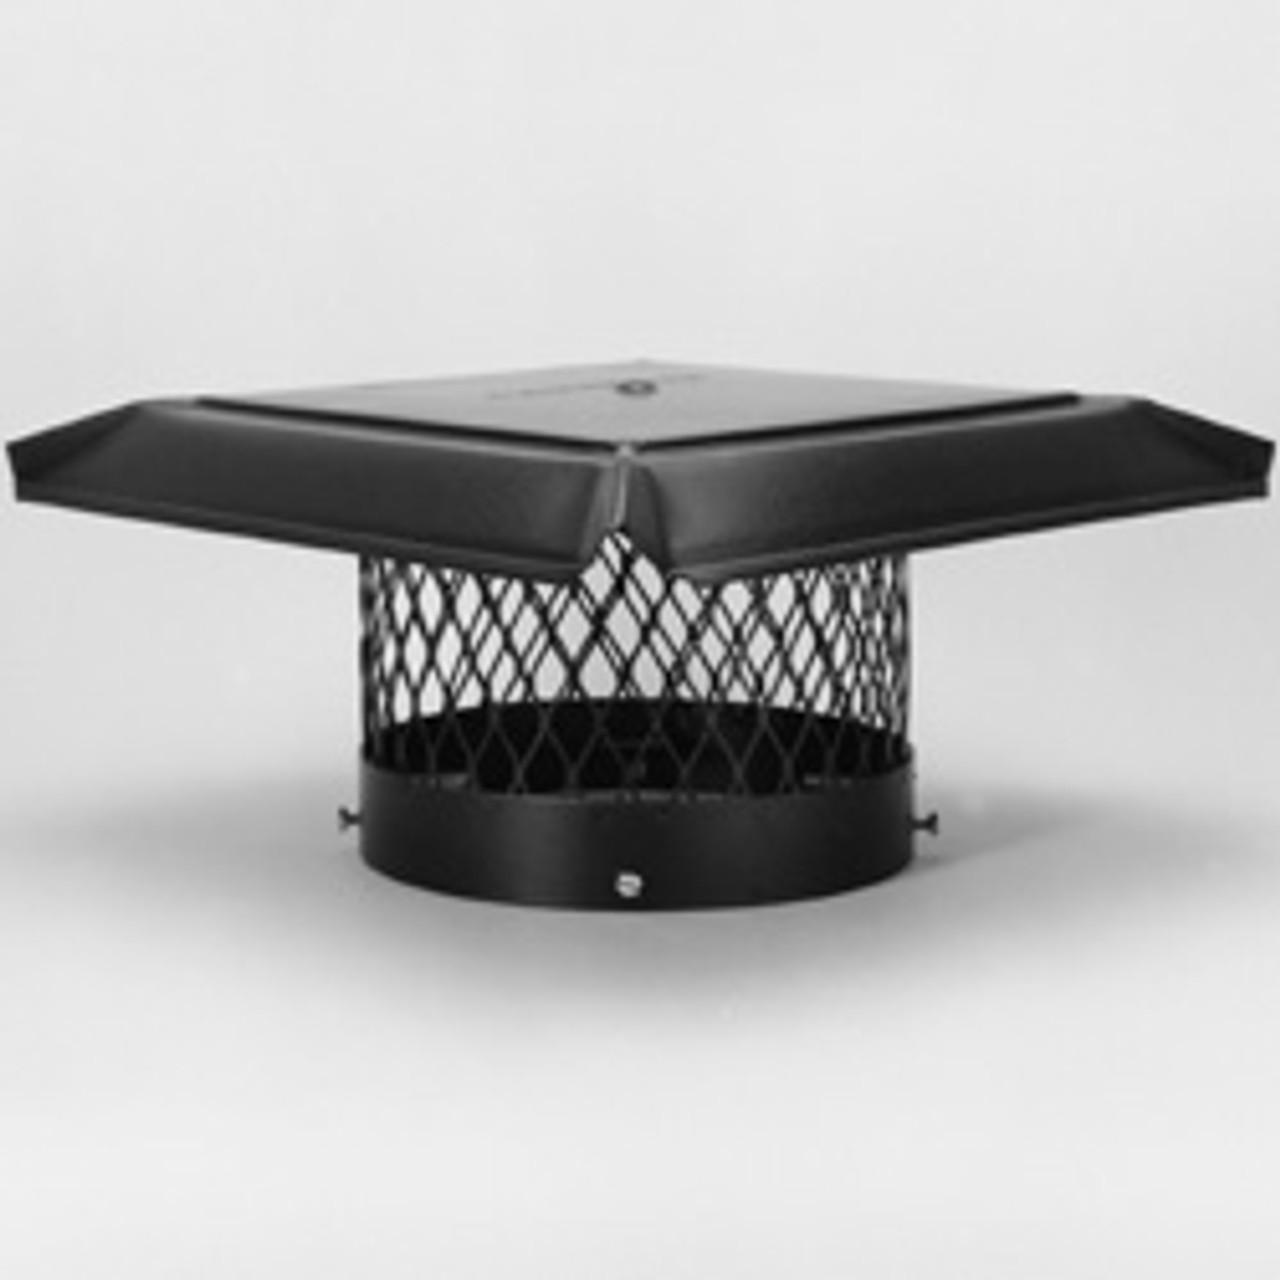 Galvanized round chimney cap